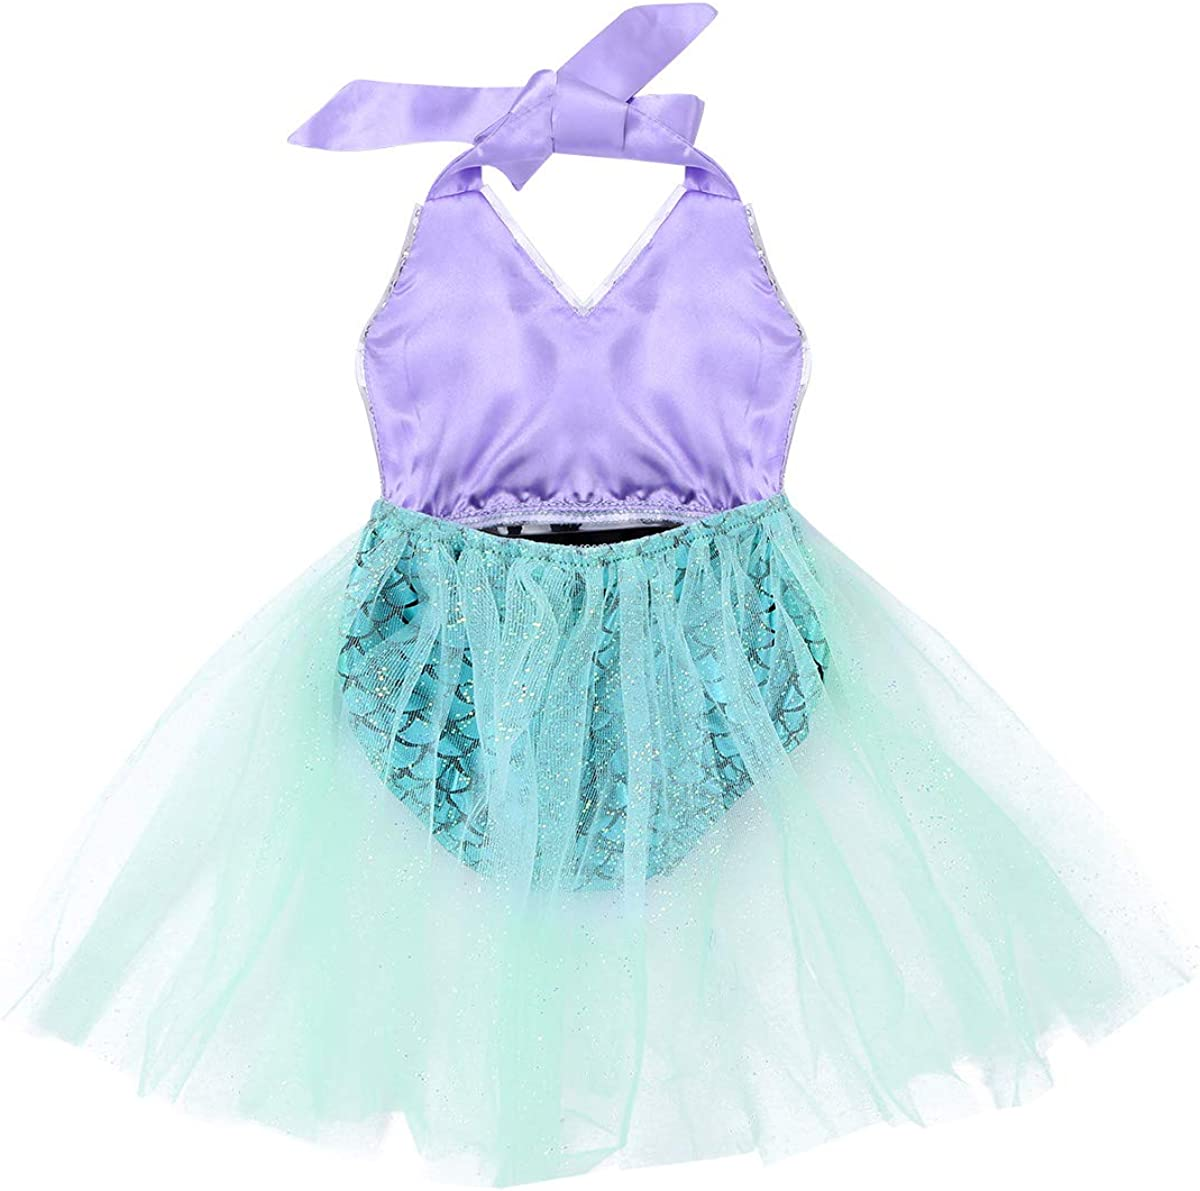 Alvivi Infant Baby Girls Shiny Sequins Mermaid Romper Dress Bodysuit Swimwear Cosplay Clothes